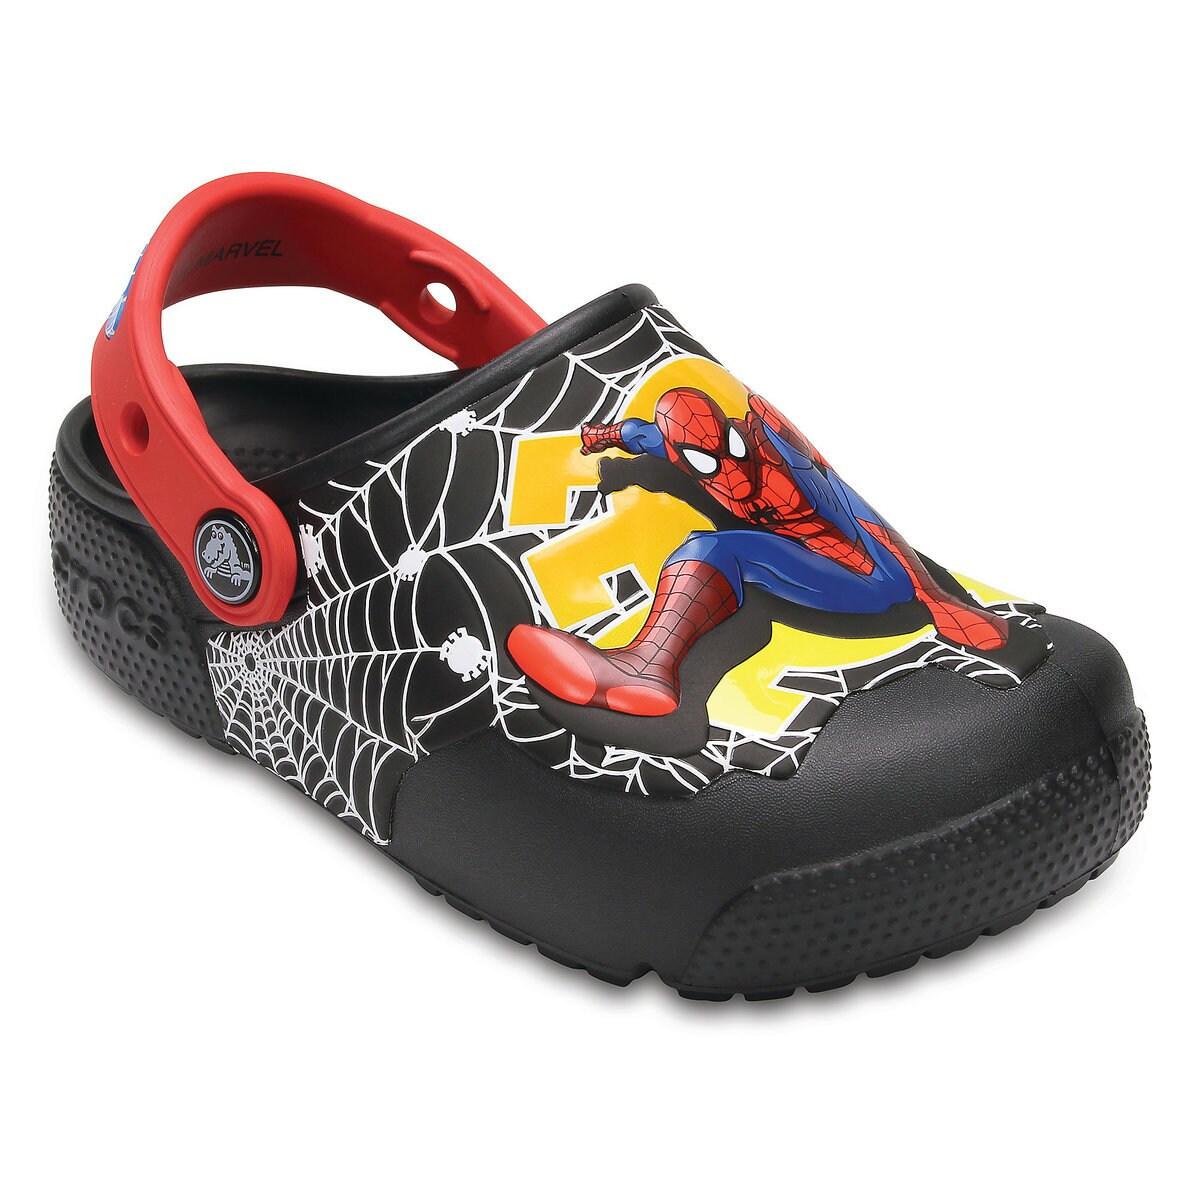 e78e654d81dd Product Image of Spider-Man Crocs™ Light-Up Clogs for Boys   1